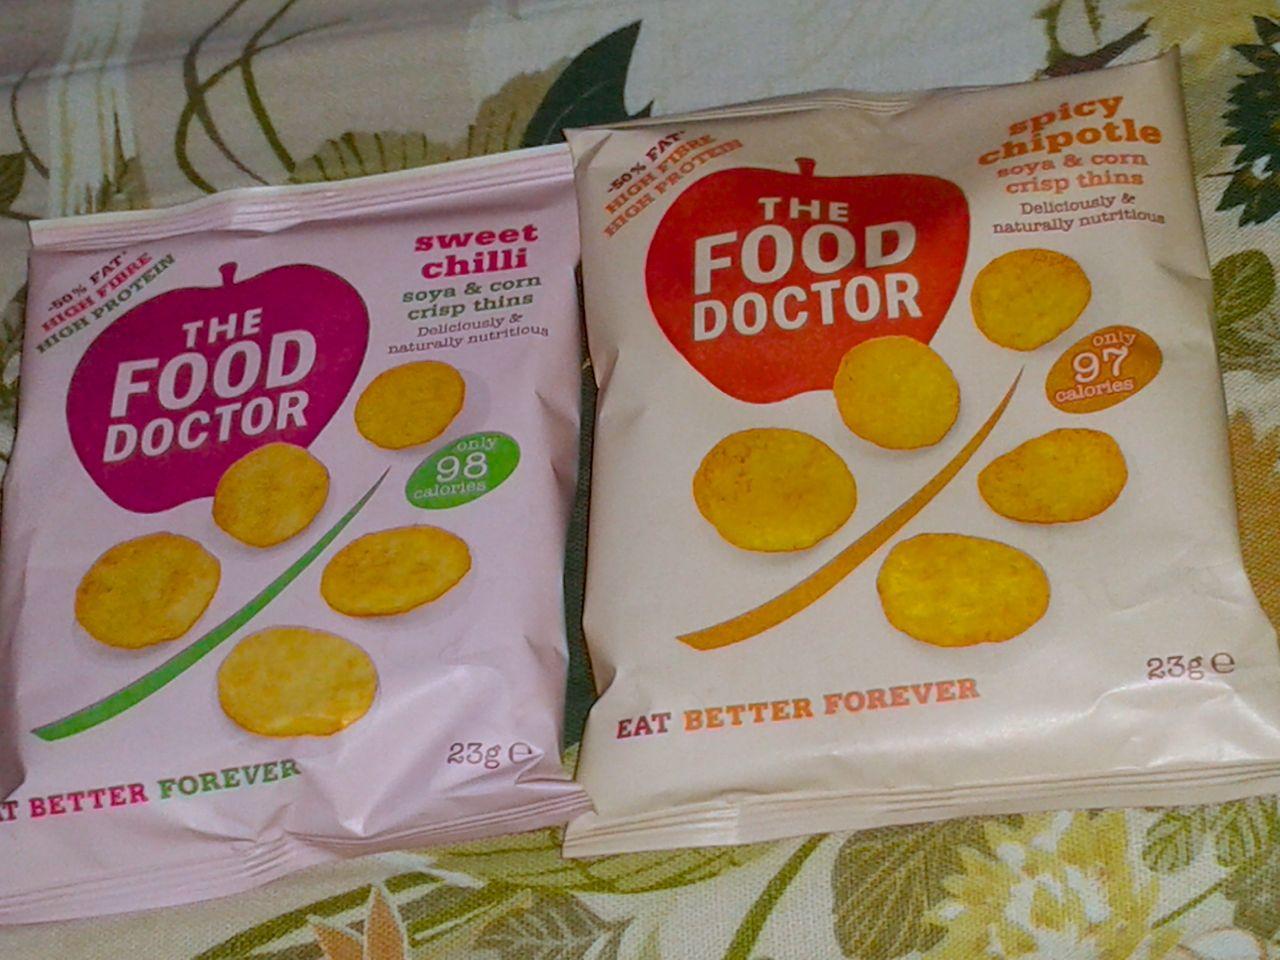 http://fatgayvegan.com/wp-content/uploads/2014/02/food-doctor.jpg